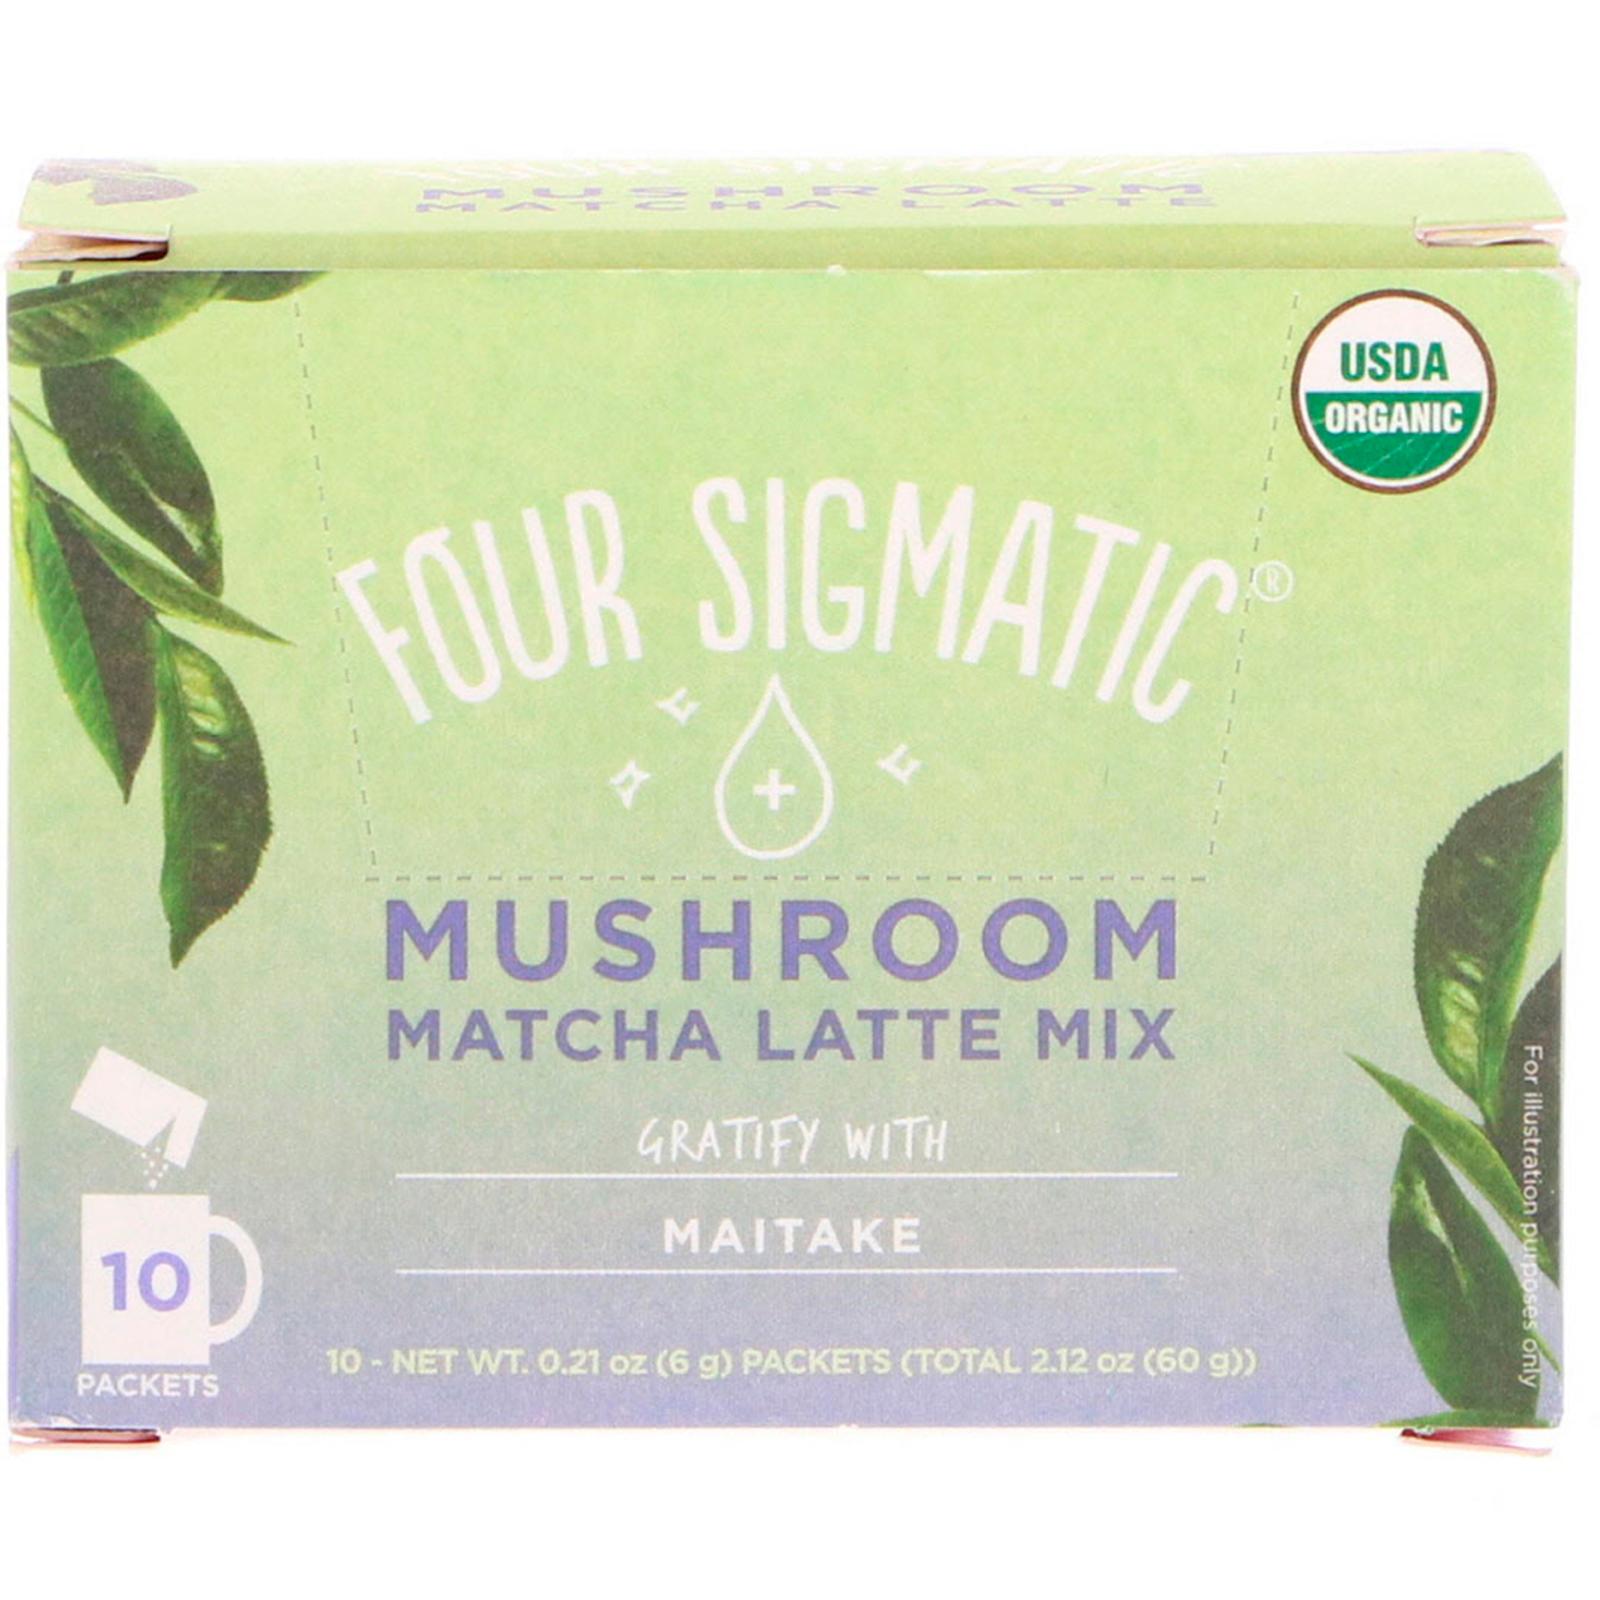 Four Sigmatic, Mushroom Matcha Latte Mix, 10 Packets, 0.21